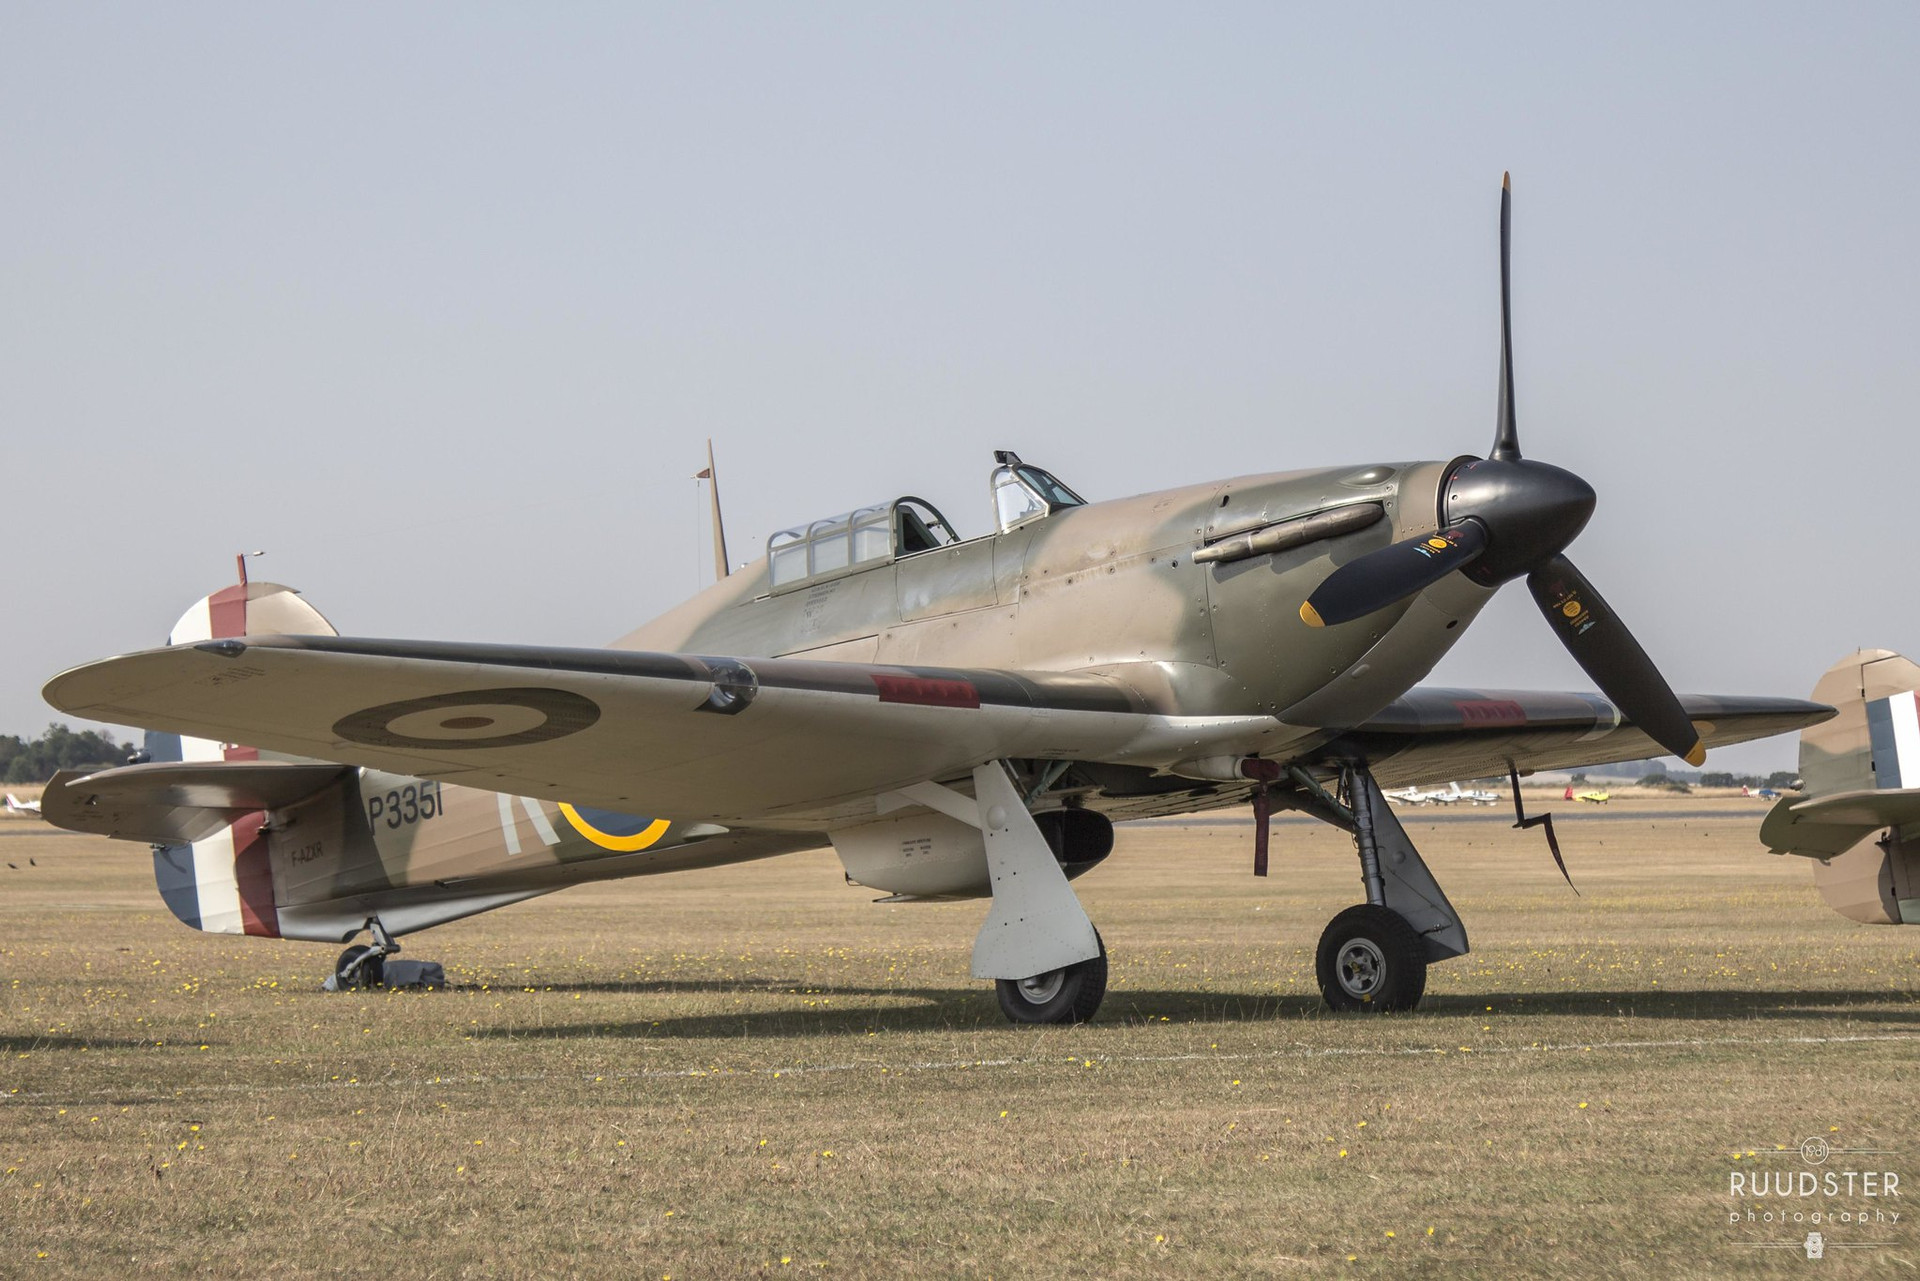 P3351 / F-AZXR   Build: 1940 - Hawker Hurricane Mk.IIa